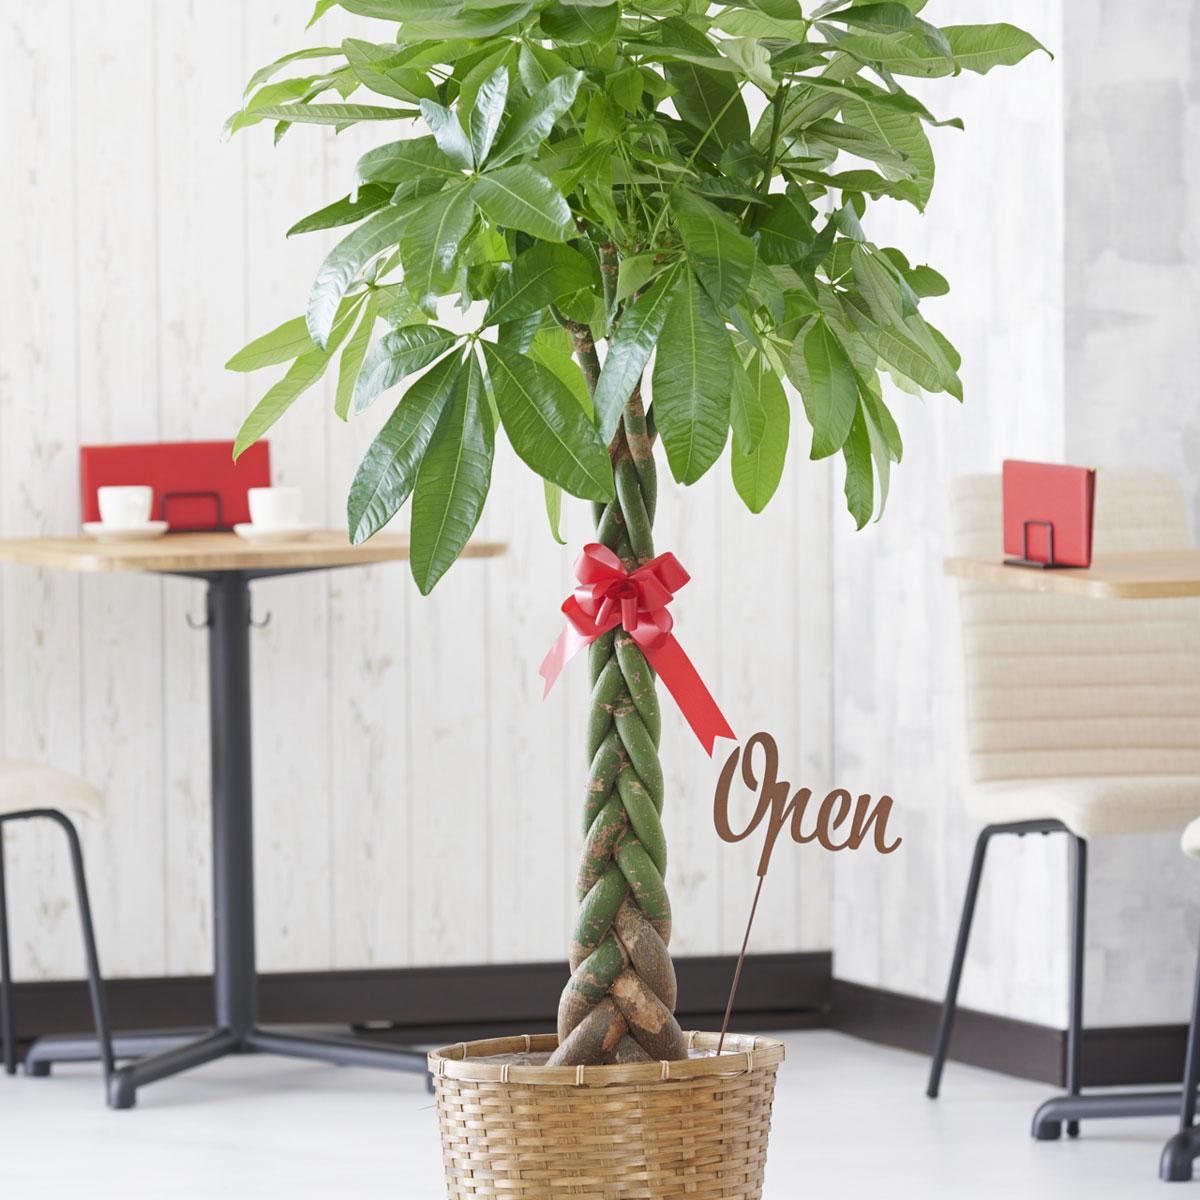 <p>観葉植物に3D立体メッセージ札[Open(文字型)]を付けたイメージ</p>